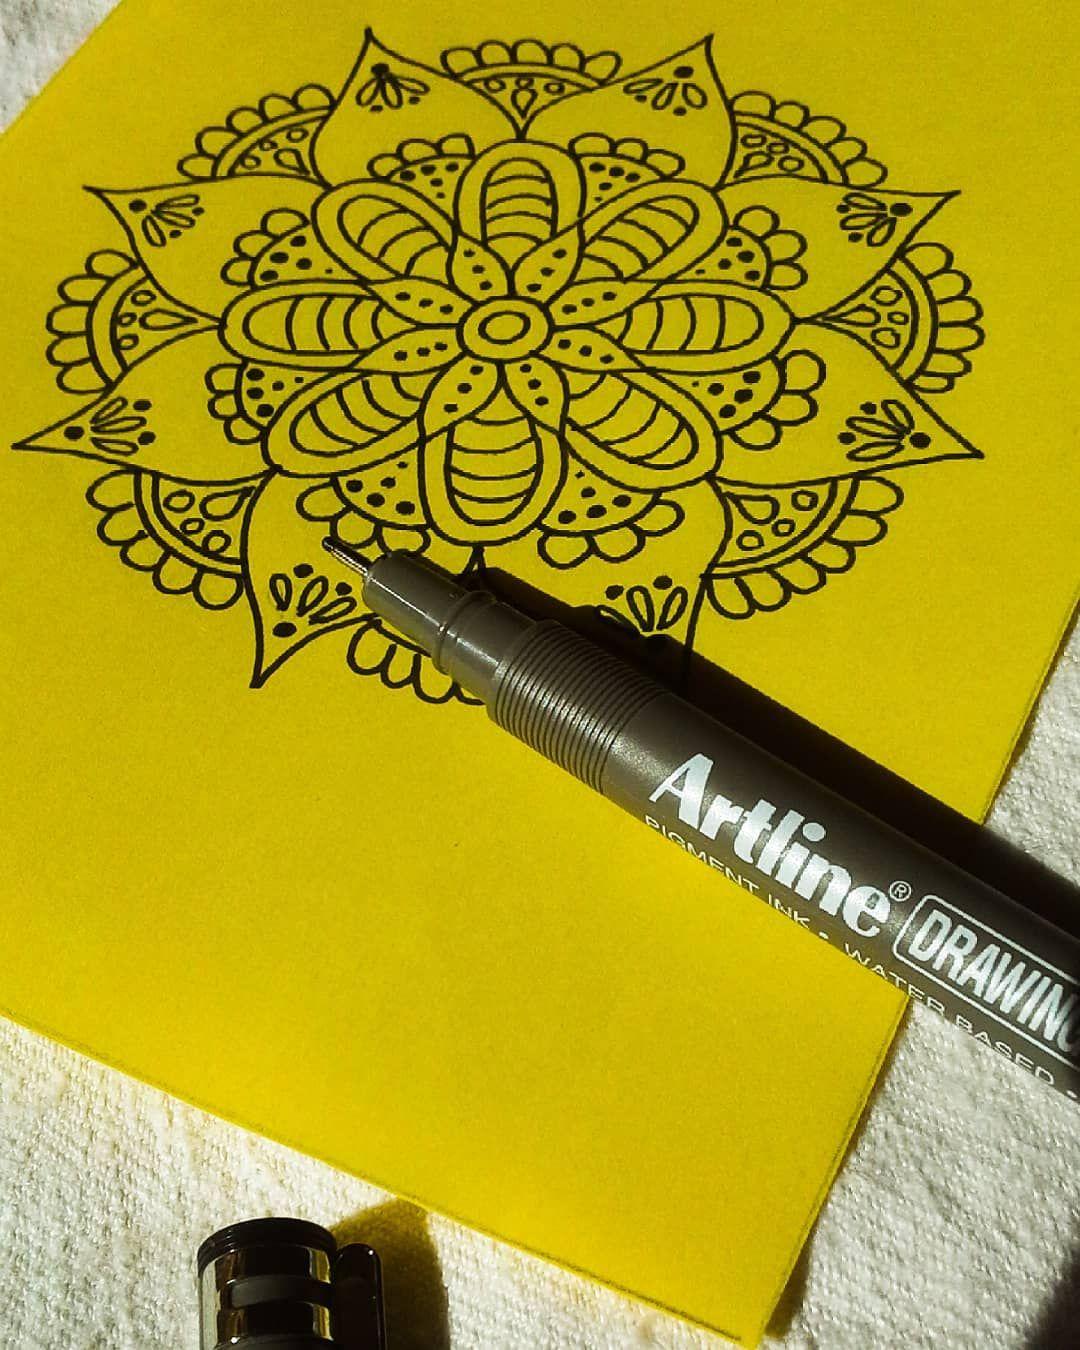 #mandala #tattoo #mandalatattoo #ink #tattoos #art #dotworktattoo #inked #blackwork #love #dotwork #tattooed #black #ornamentaltattoo #instagood #tattooartist #italy #tattooart #ornamental #geometric #dot #geometrictattoo #artist #photooftheday #handmade #mandalaart #mandalas #picoftheday #blackworktattoo #drawing